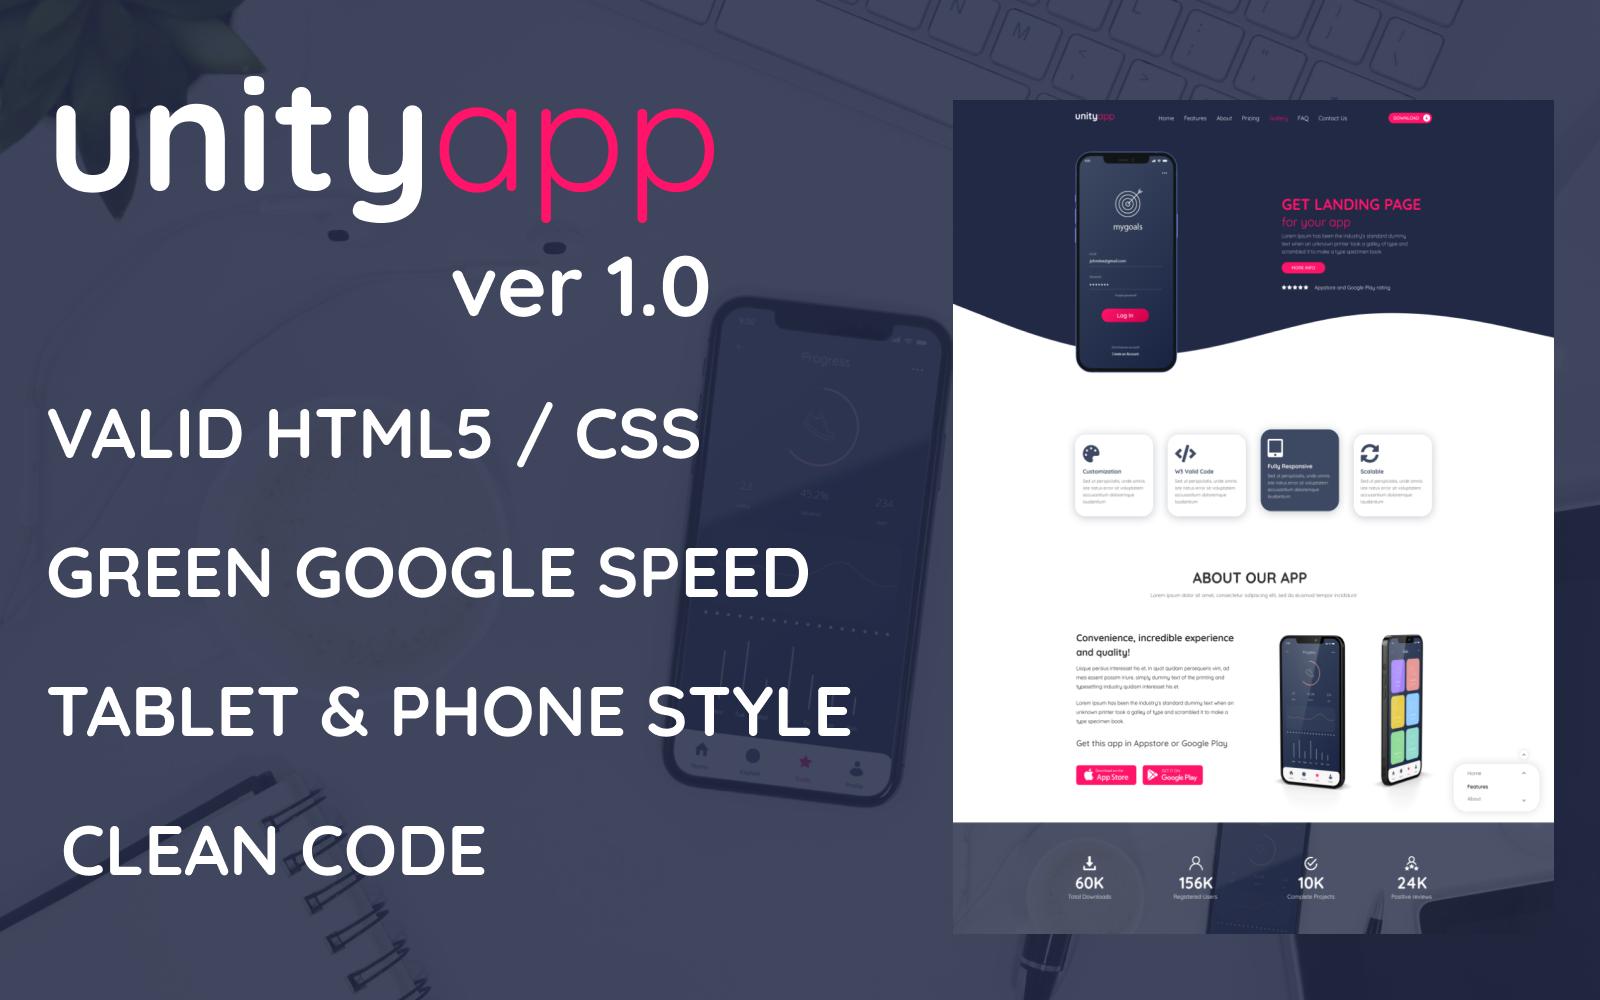 Unityapp - Software App Landing Page